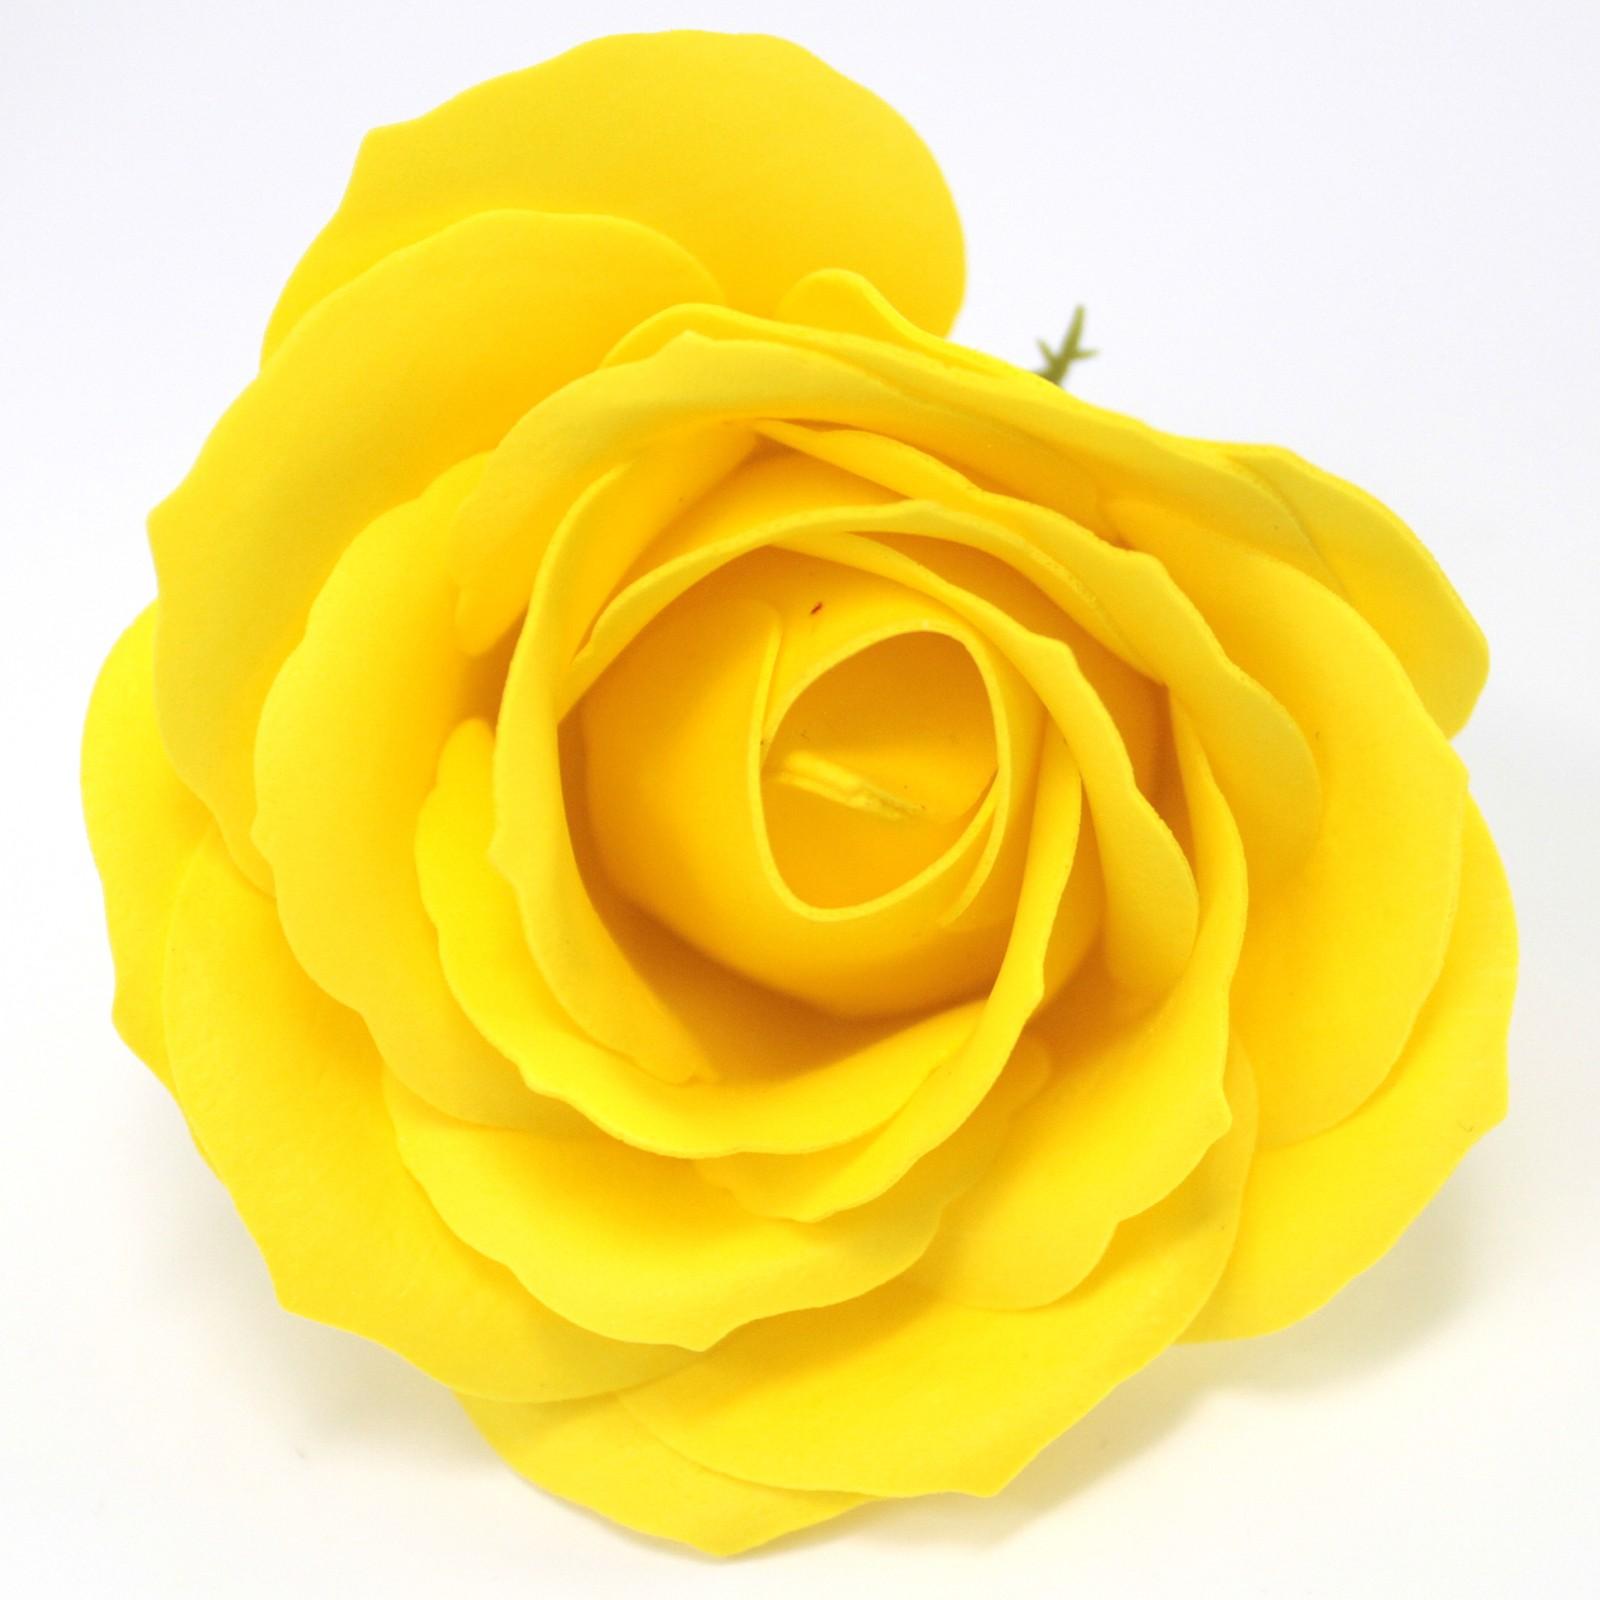 Craft Soap Flowers Lrg Rose Yellow